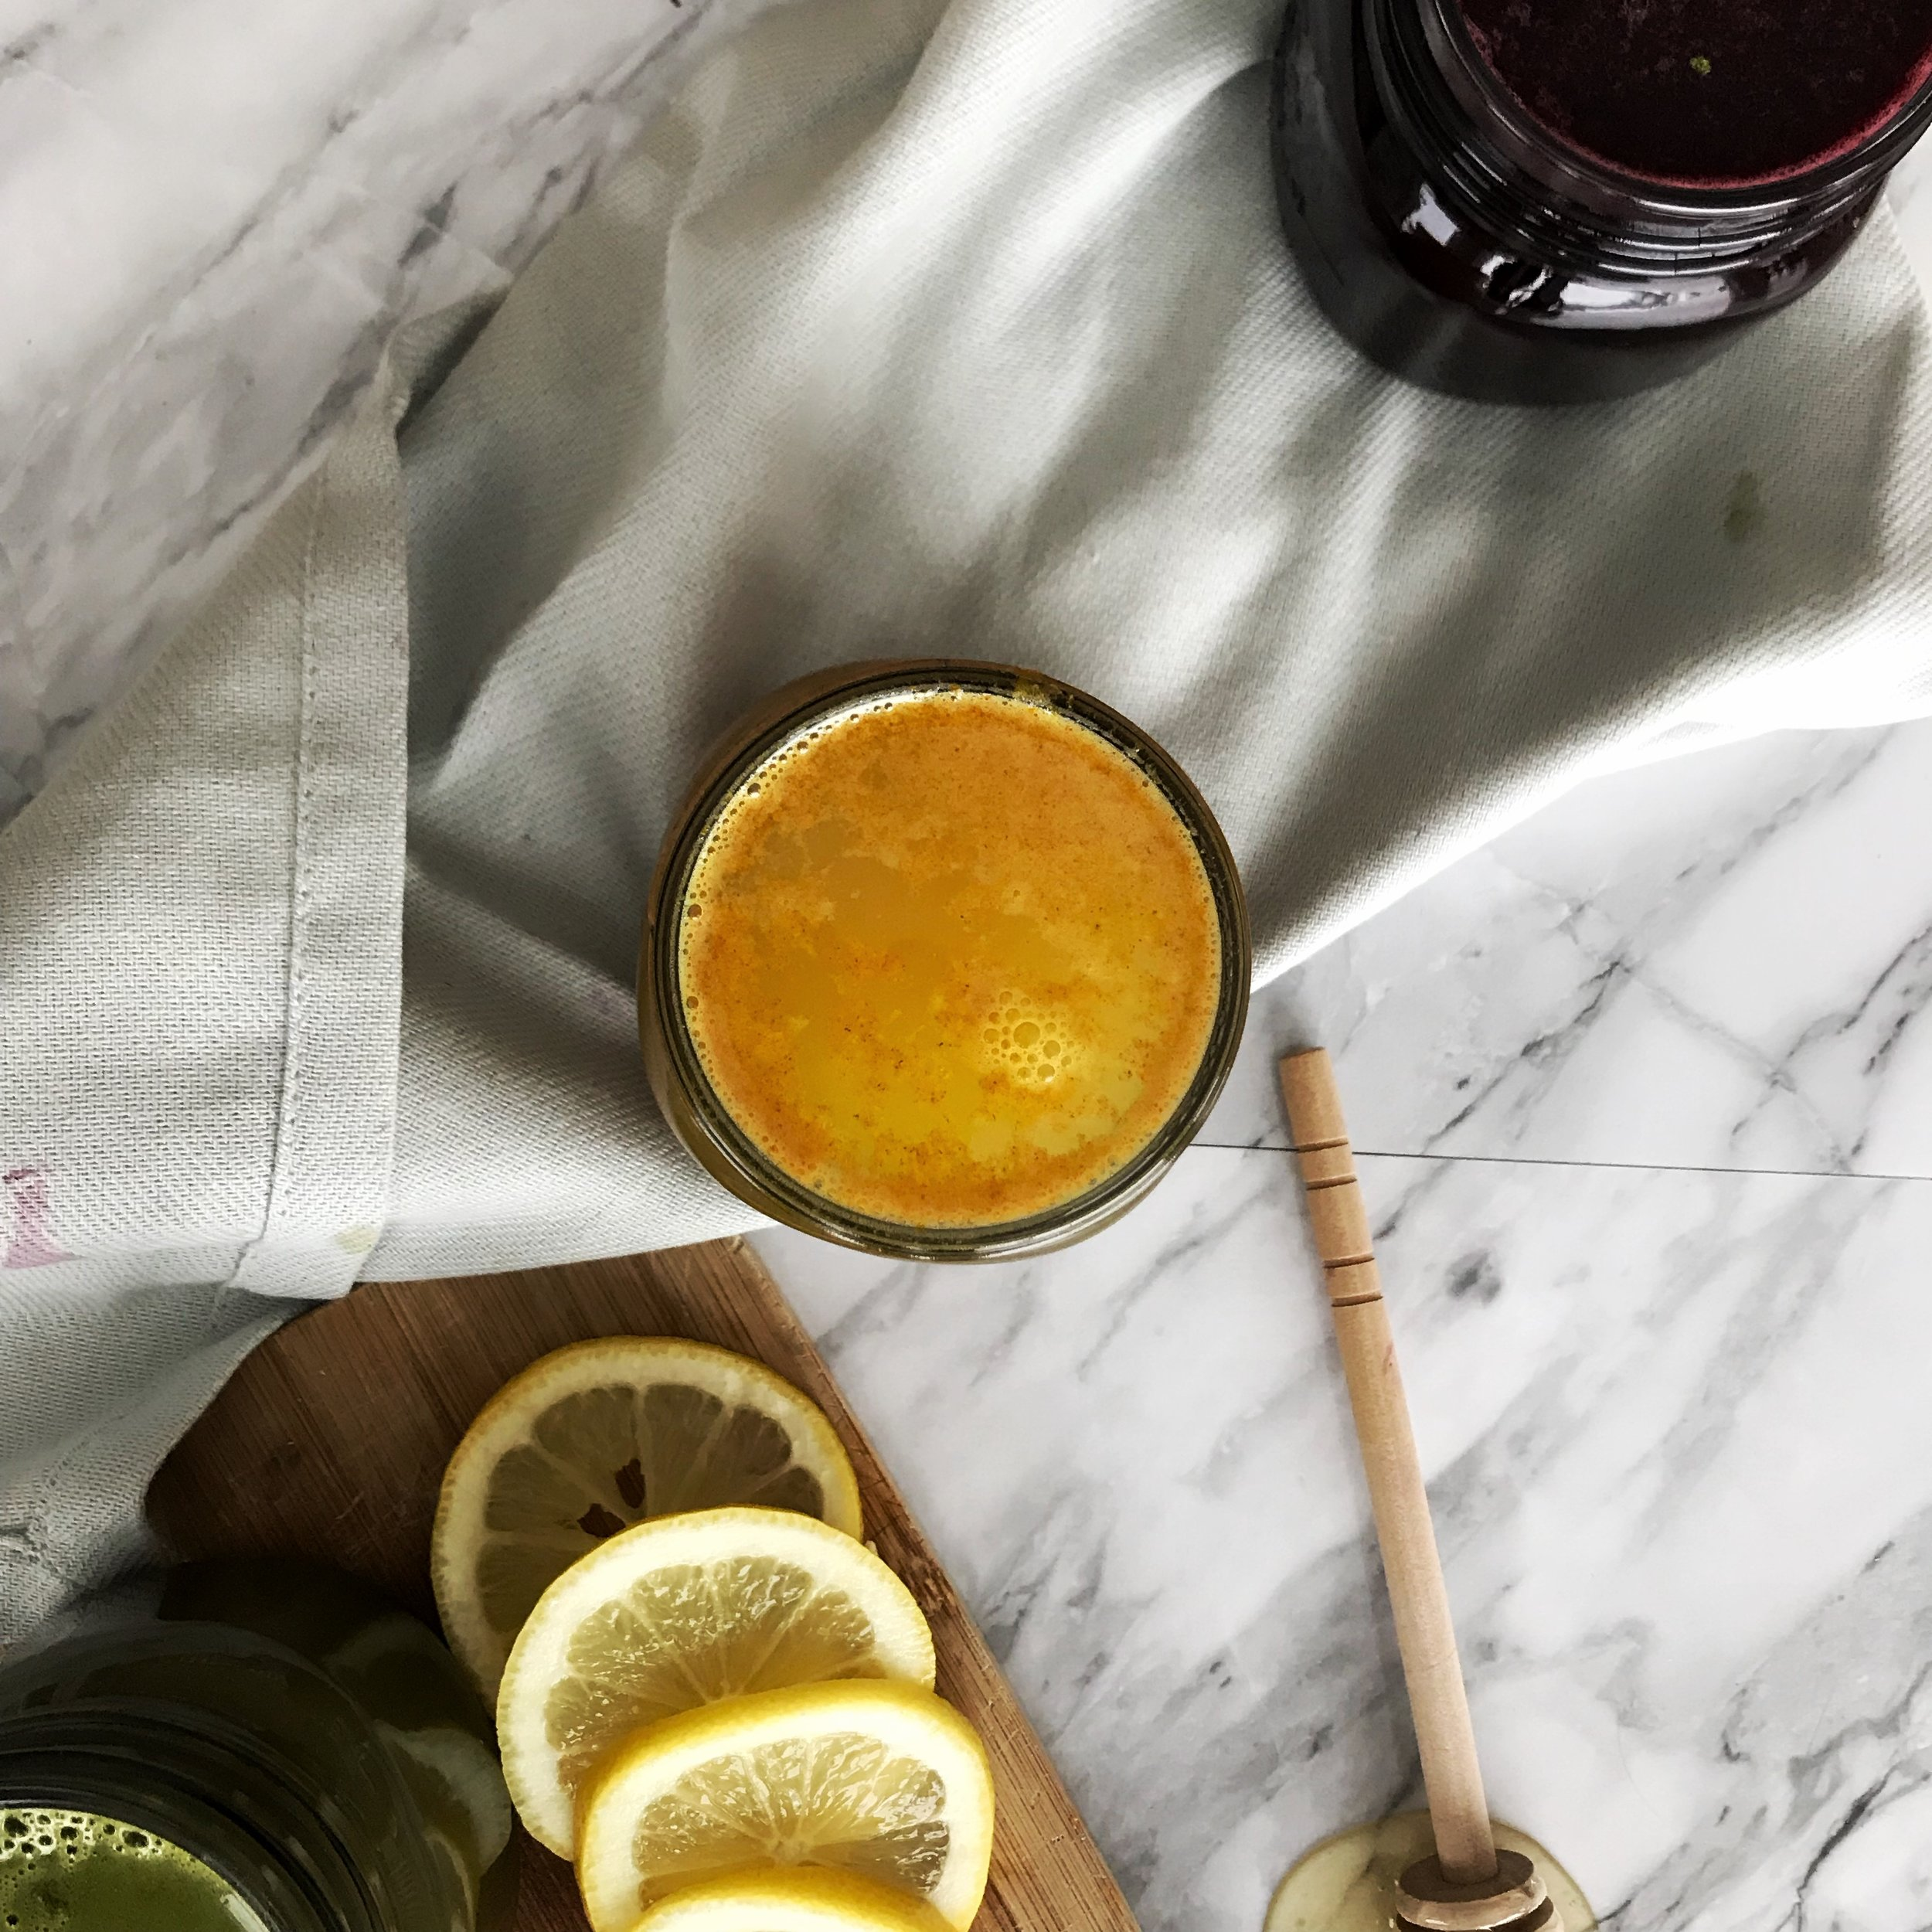 Turmeric Tonic - 1/4 tsp fresh ginger, chopped1/4 tsp ground cinnamon1/4 tsp turmeric powderA pinch of black pepper1/4 tsp honey to taste1 tbsp lemon juice8 - 10 oz hot water